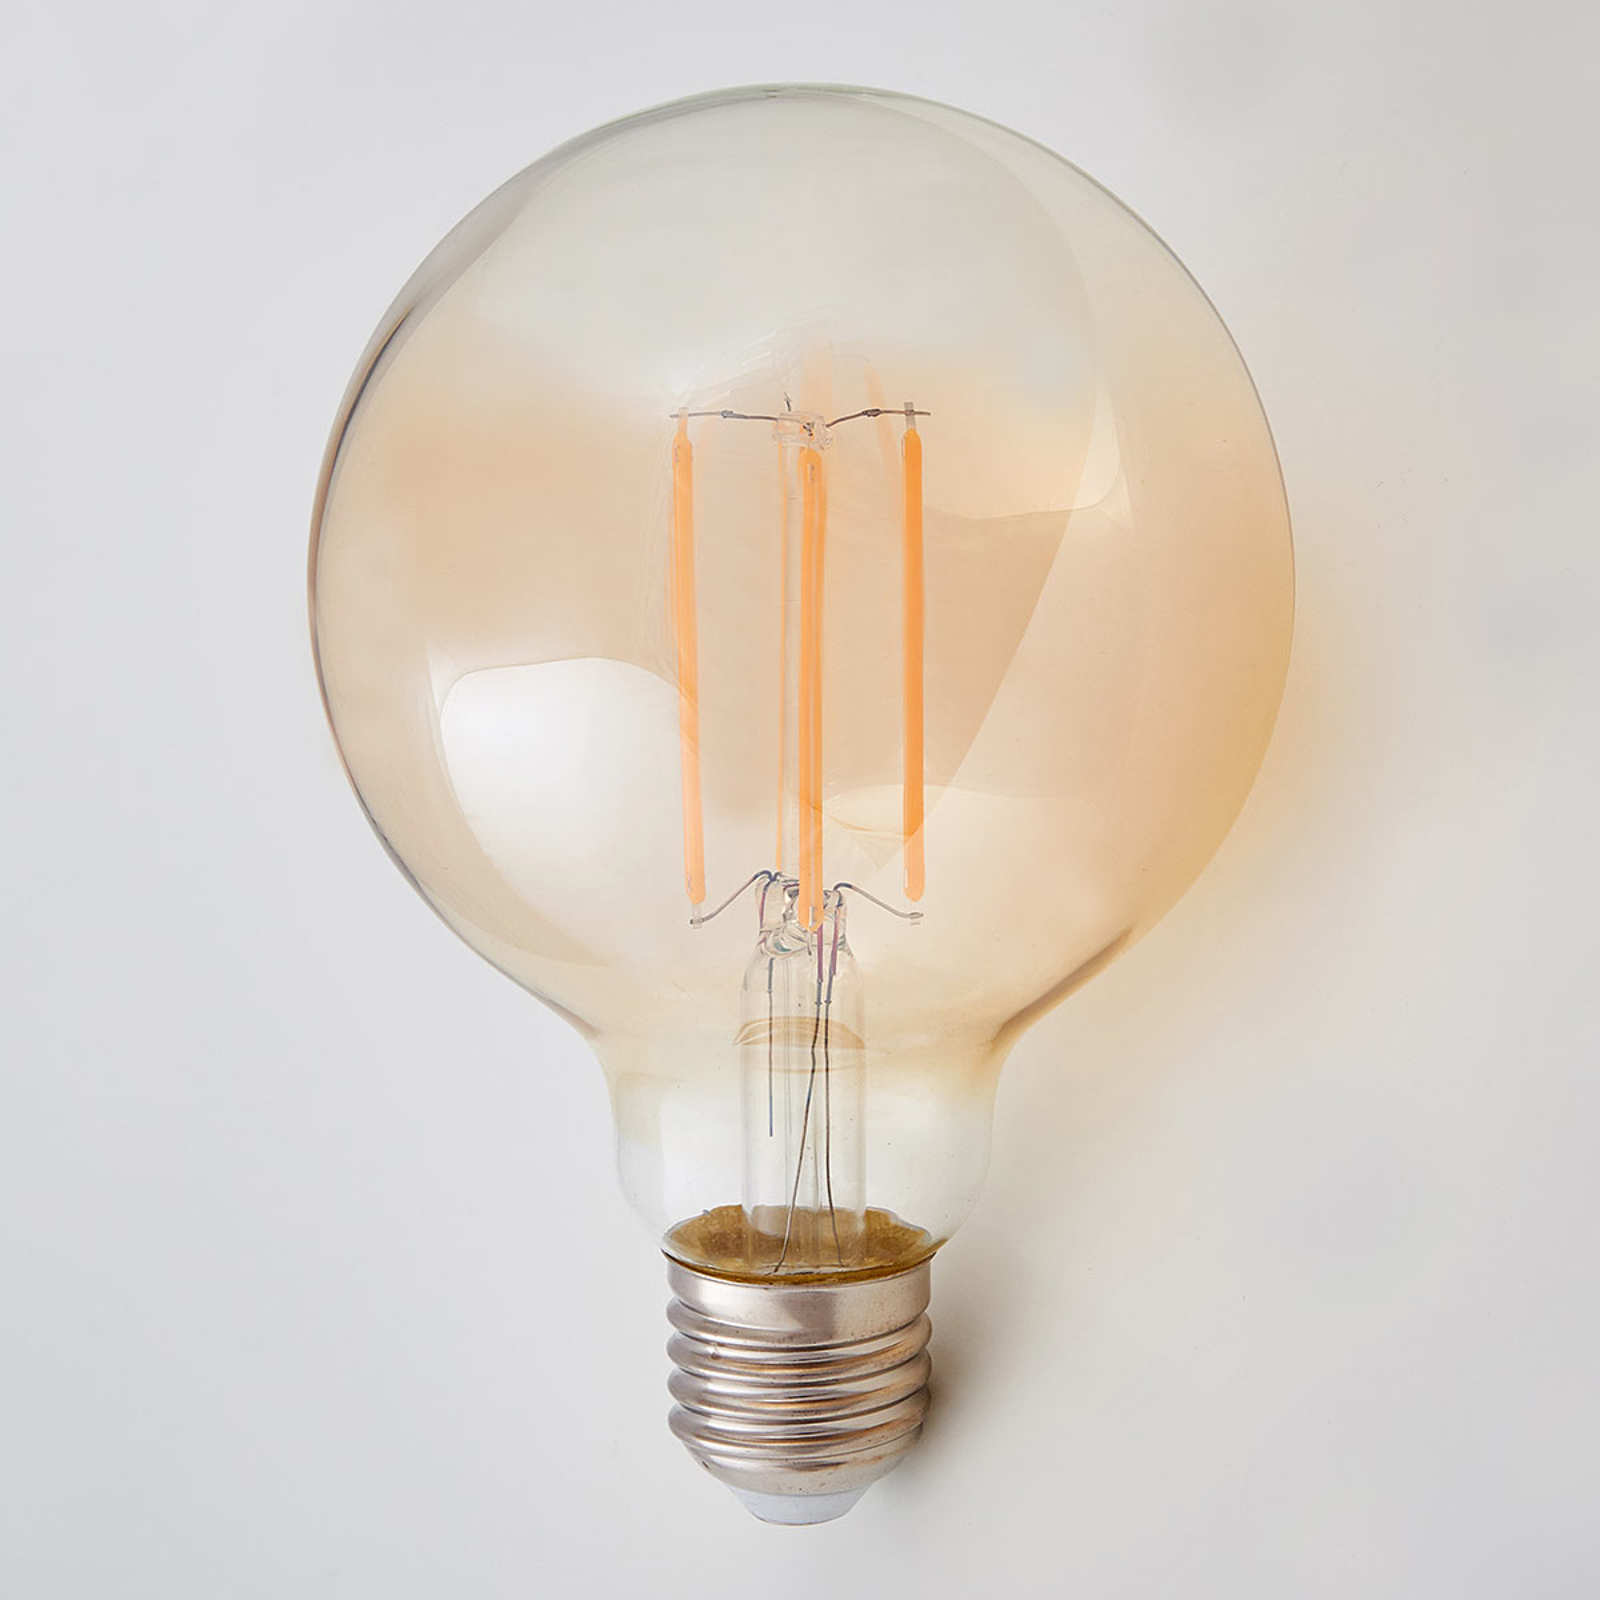 Ampoule globe LED E27 6W, 500lm, ambre, 2200K